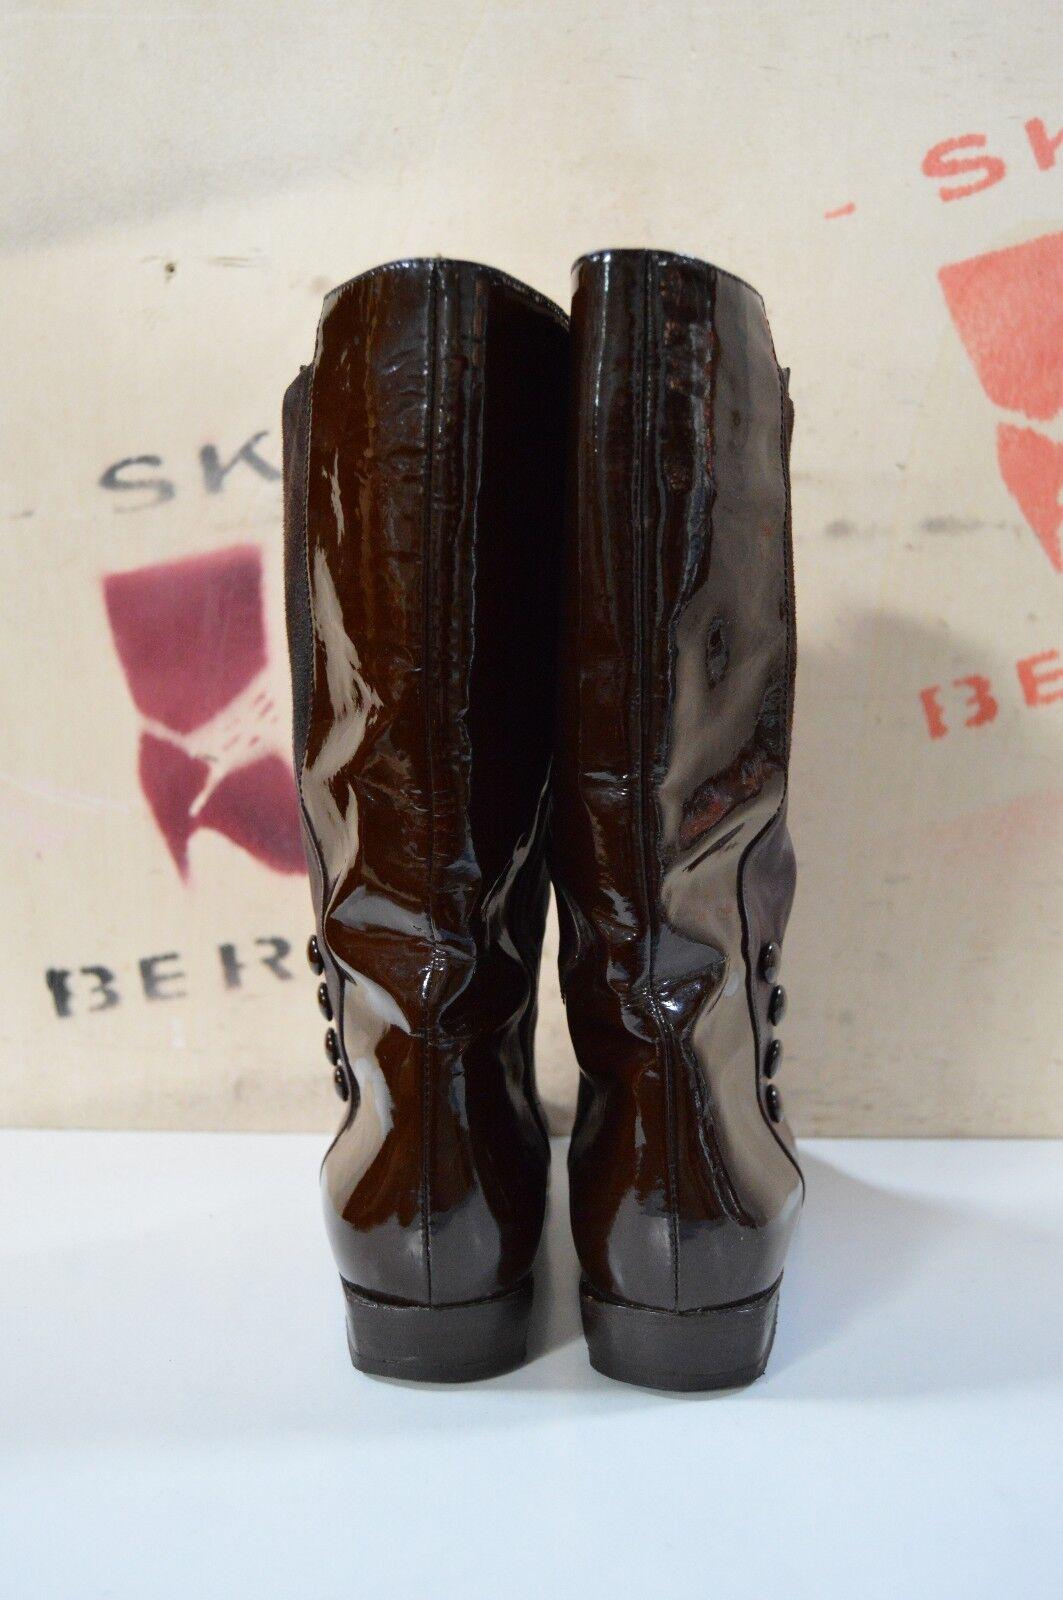 Femmes verni bottes Brunella cavaliers style 90er true vintage vintage vintage bottes laquer marron 3e4591